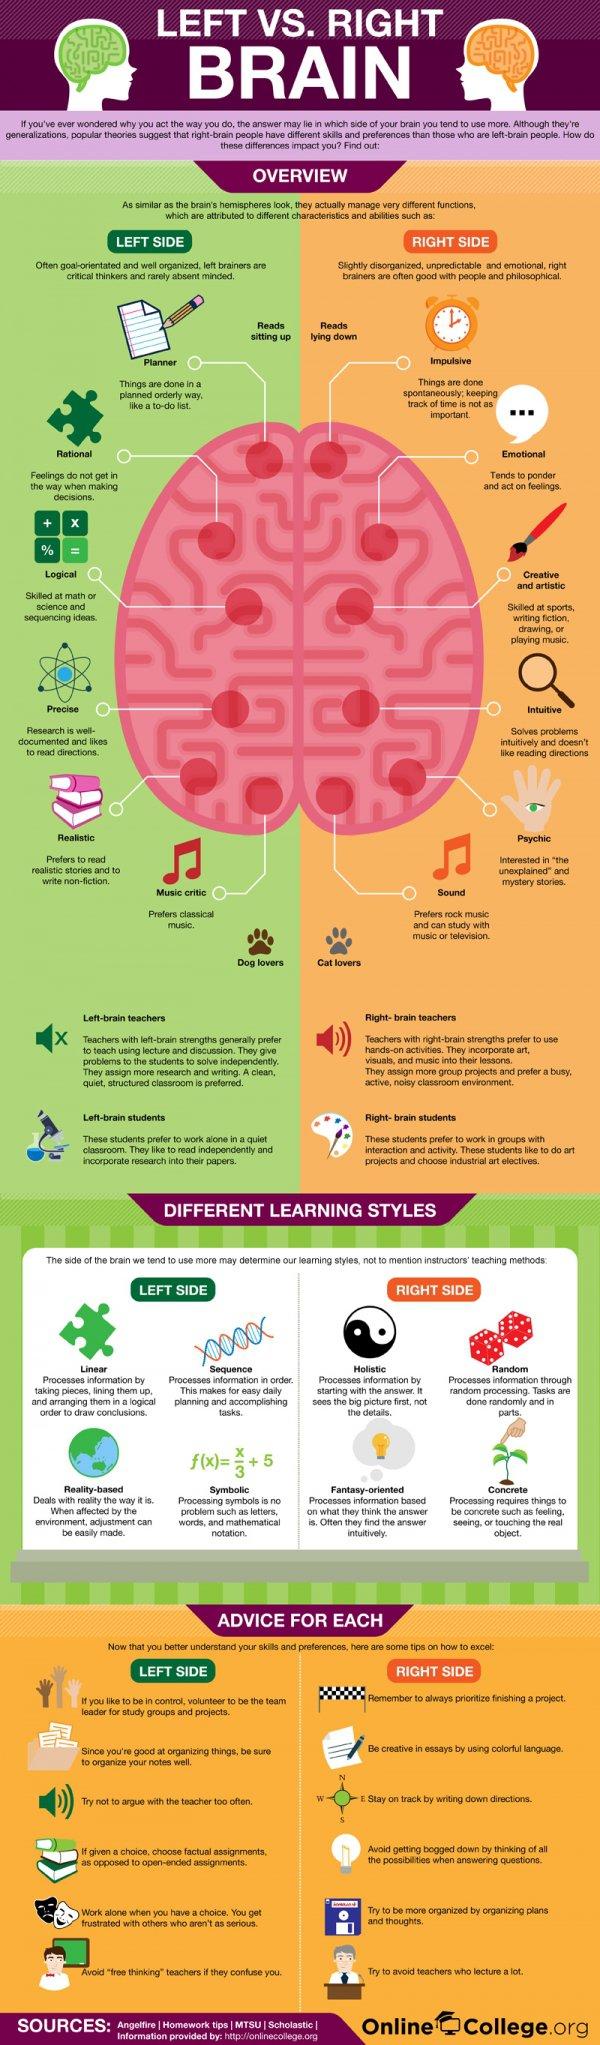 ecosystem,biology,diagram,brand,advertising,